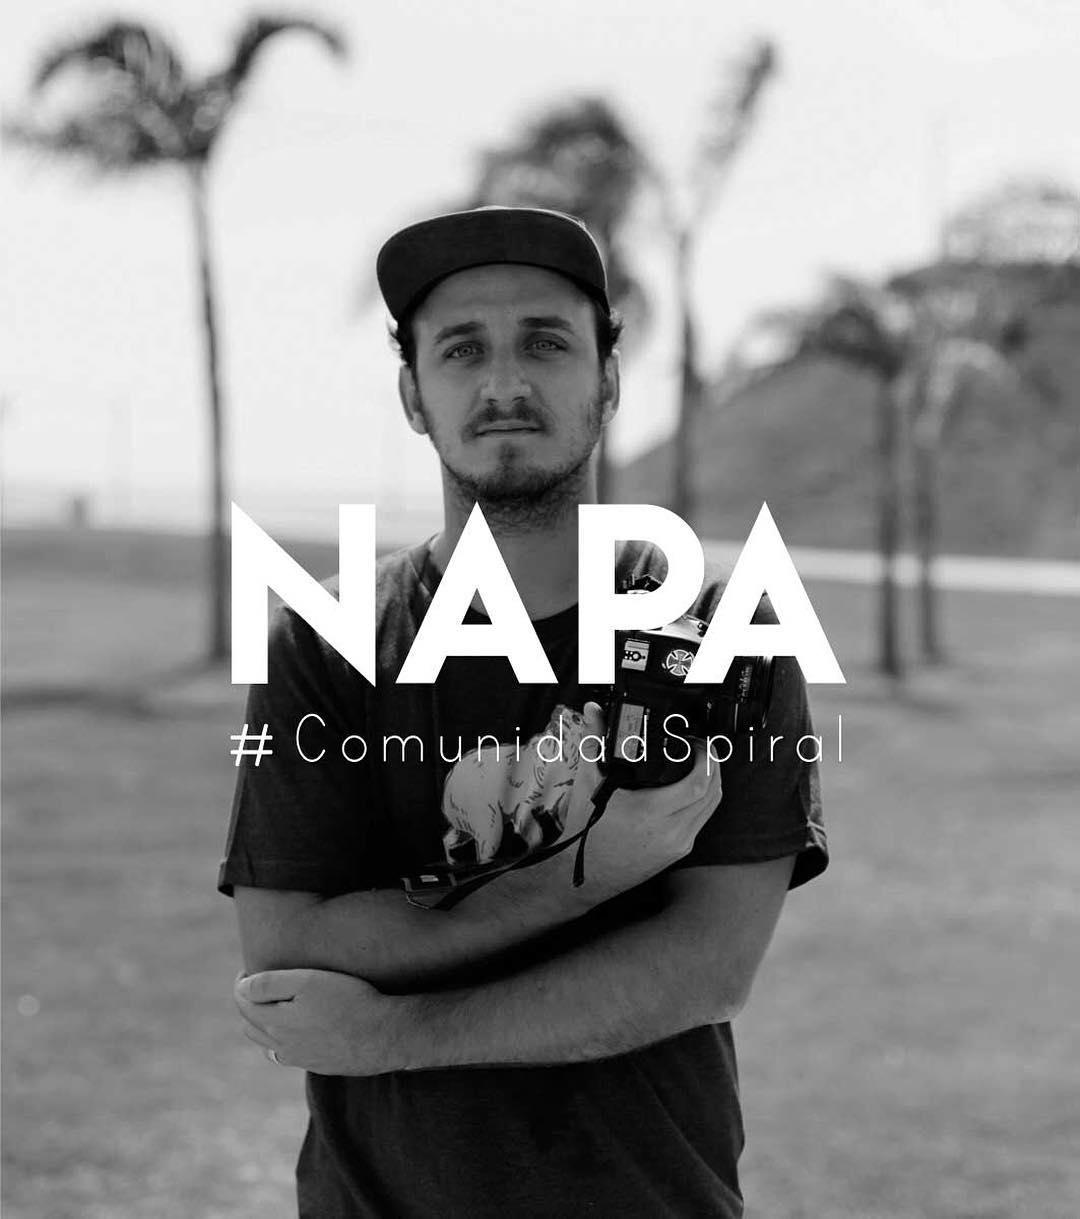 Les presentamos a Napa, un gran fotógrafo, apasionado por el skate y miembro de la Comunidad Spiral! #SpiralShoes #ComunidadSpiral #Photography #Skatepics #Skateboarding #Goskate #Skatelife #Skateeveryday #Skatecomunity